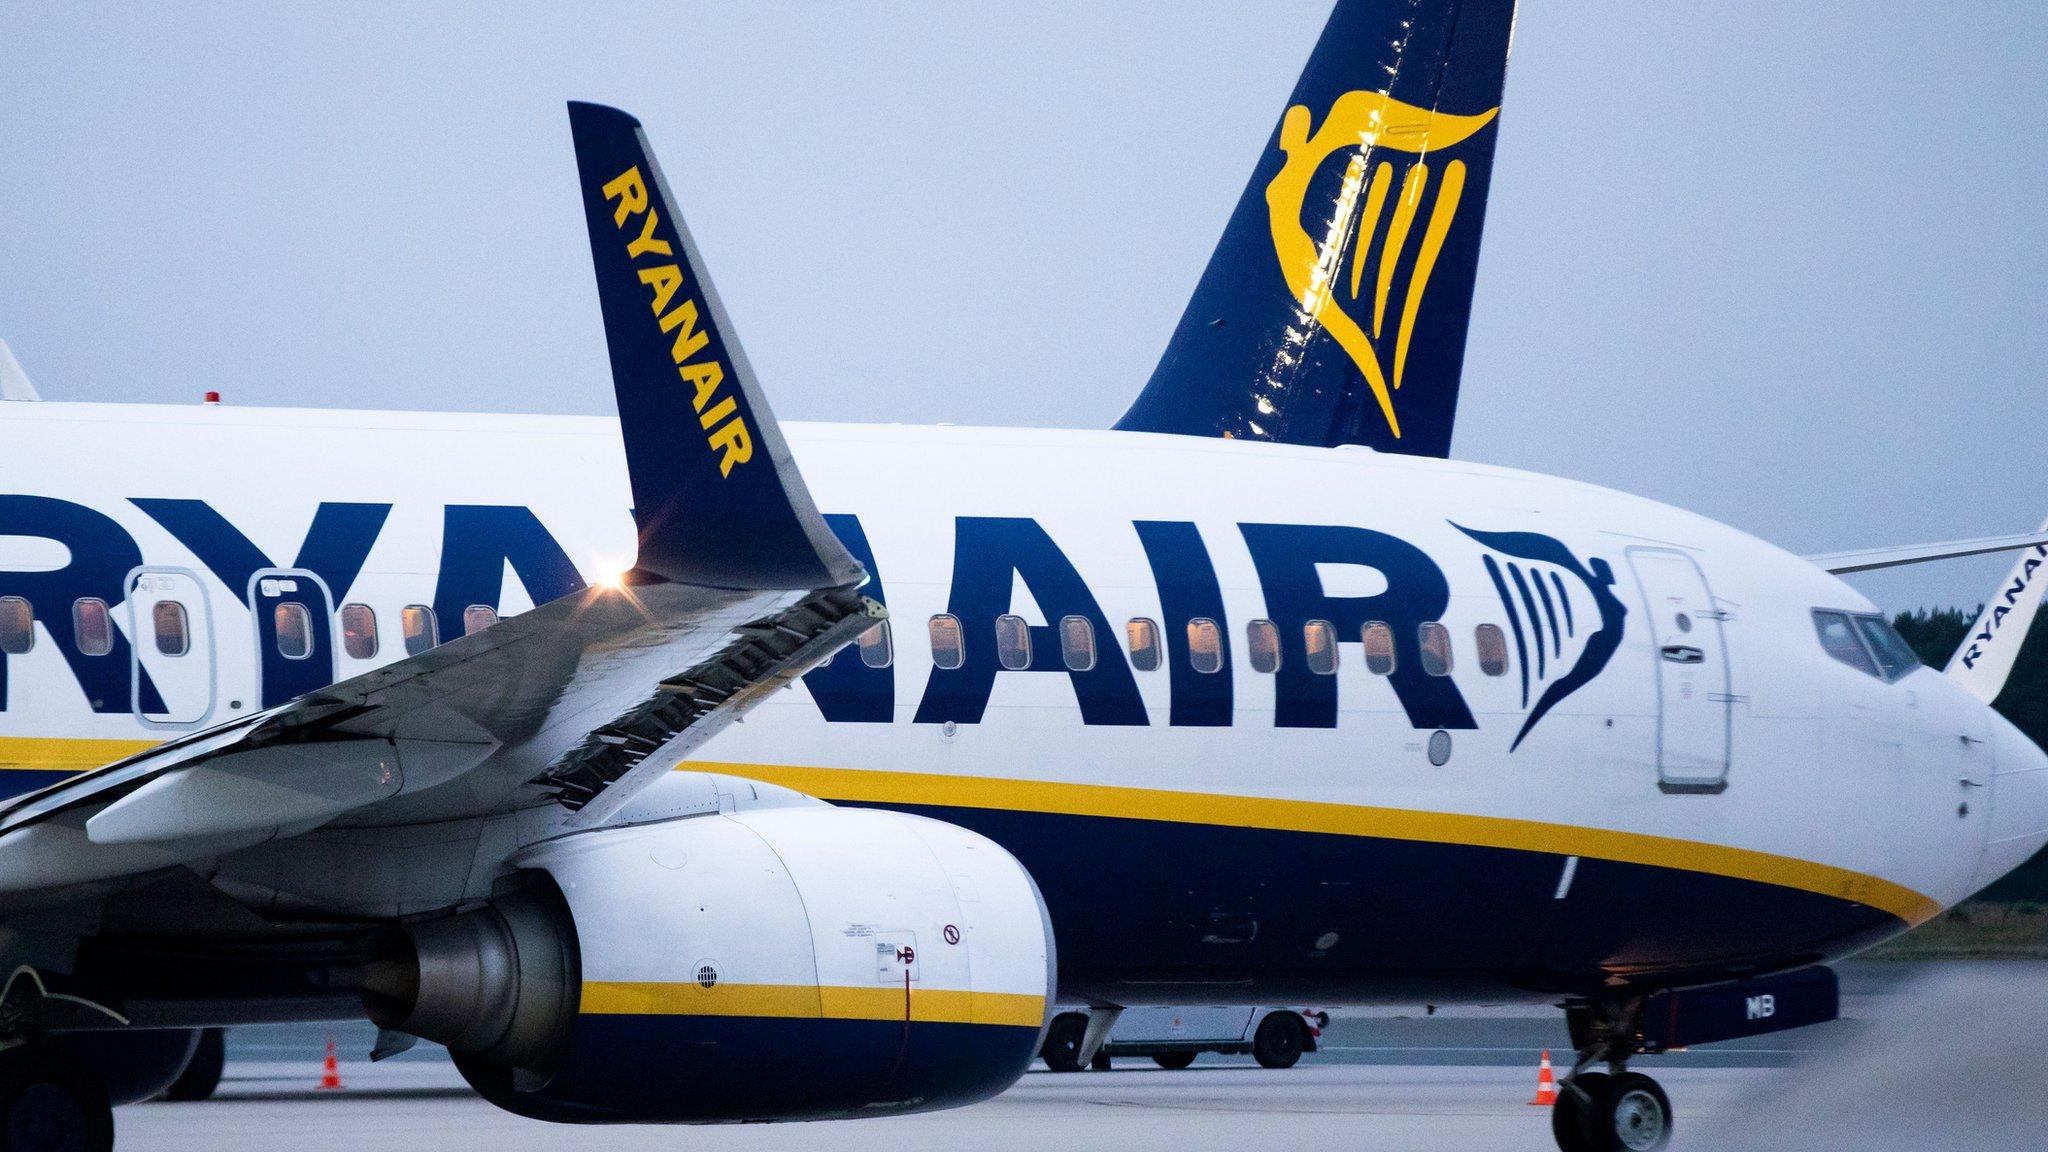 Ryanair warns on profits as strikes hit income